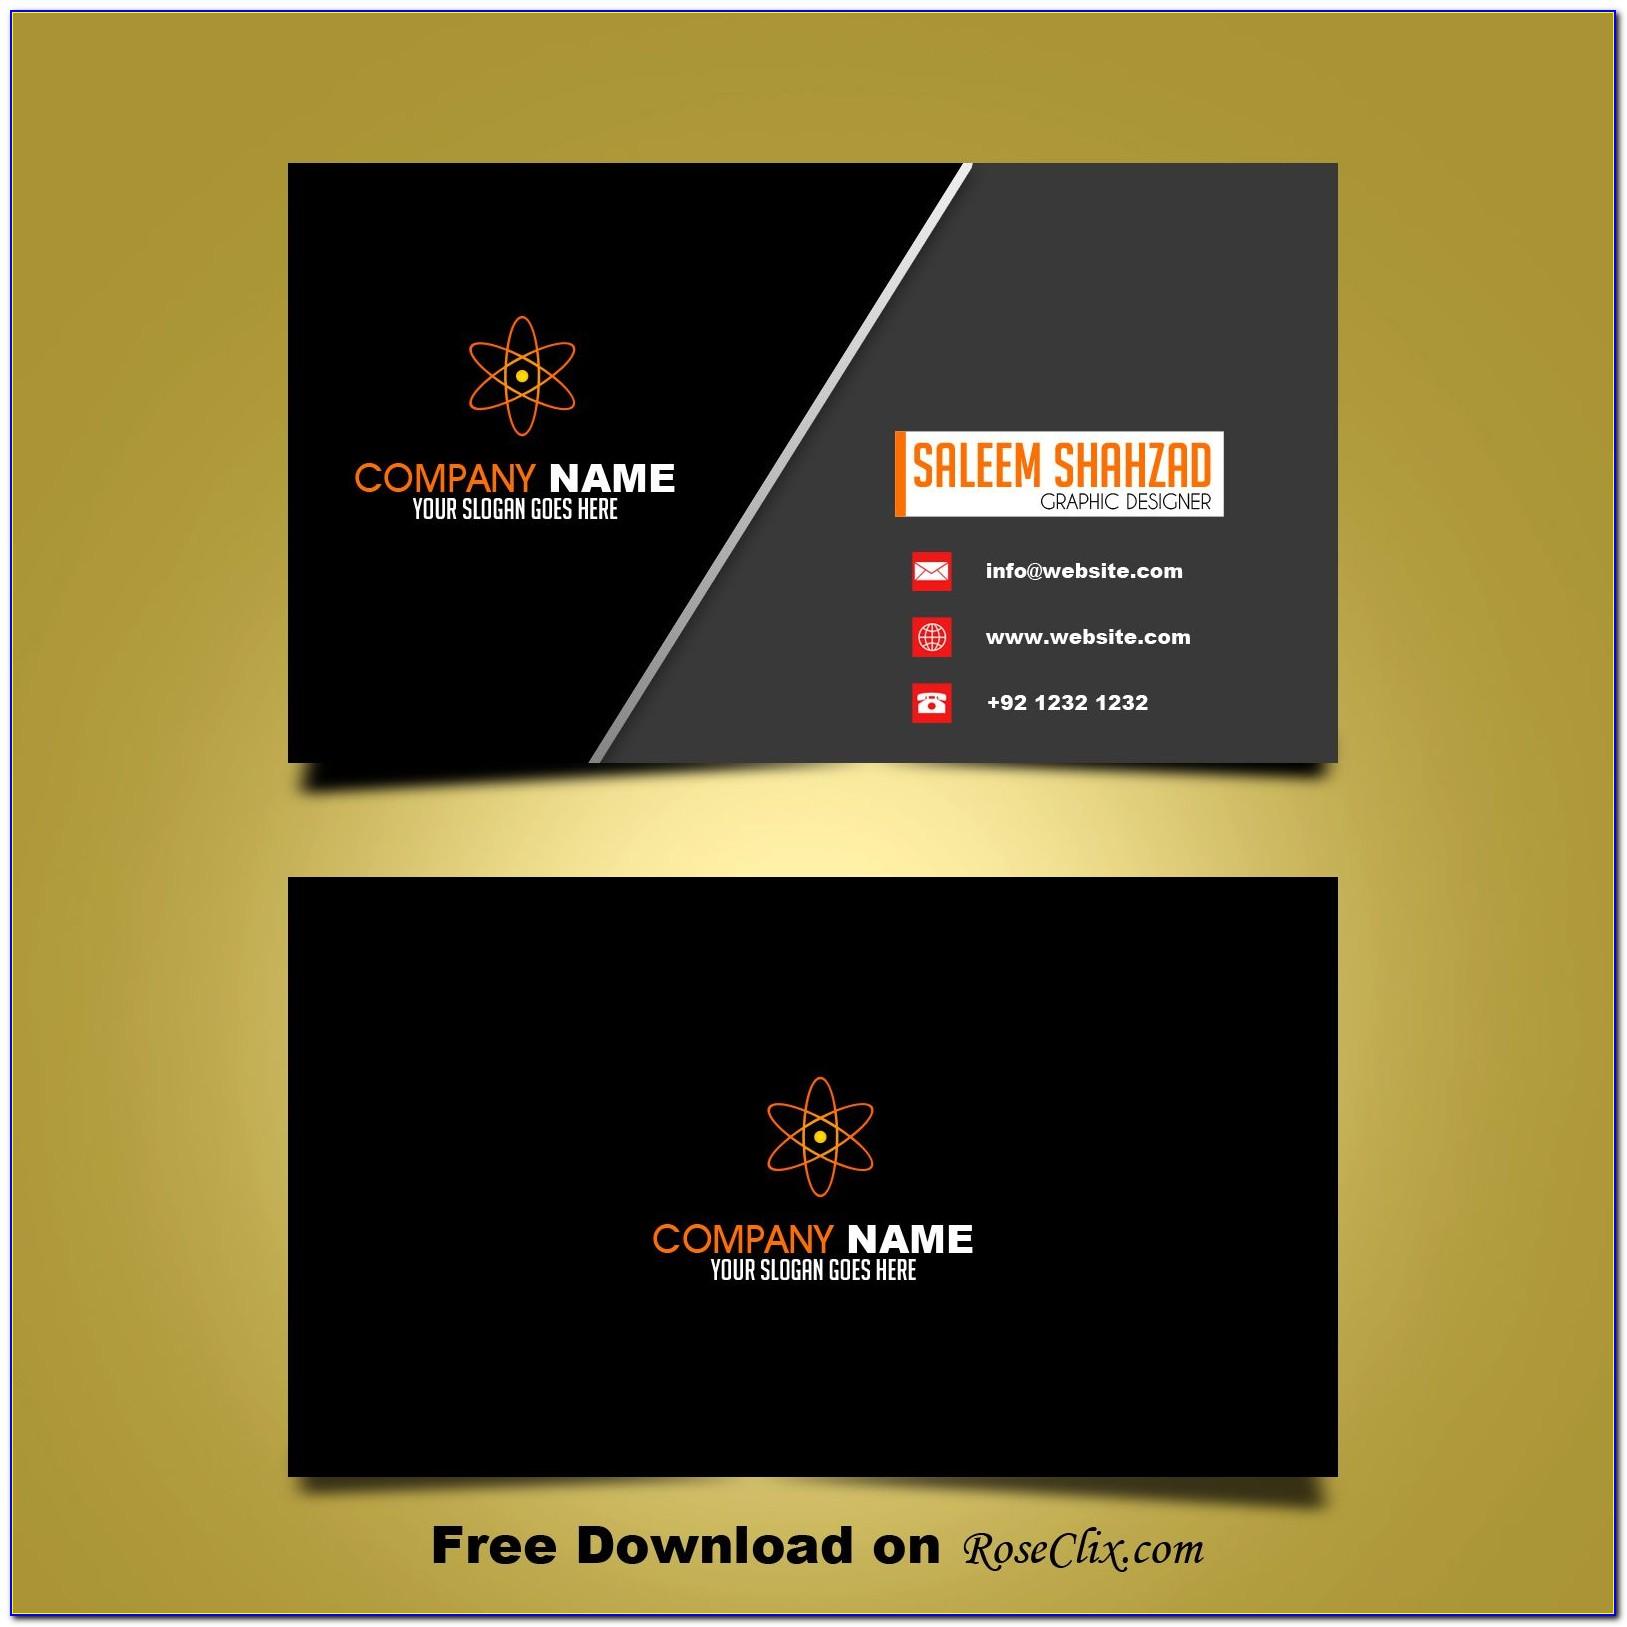 Business Card Design Cdr Format Free Download